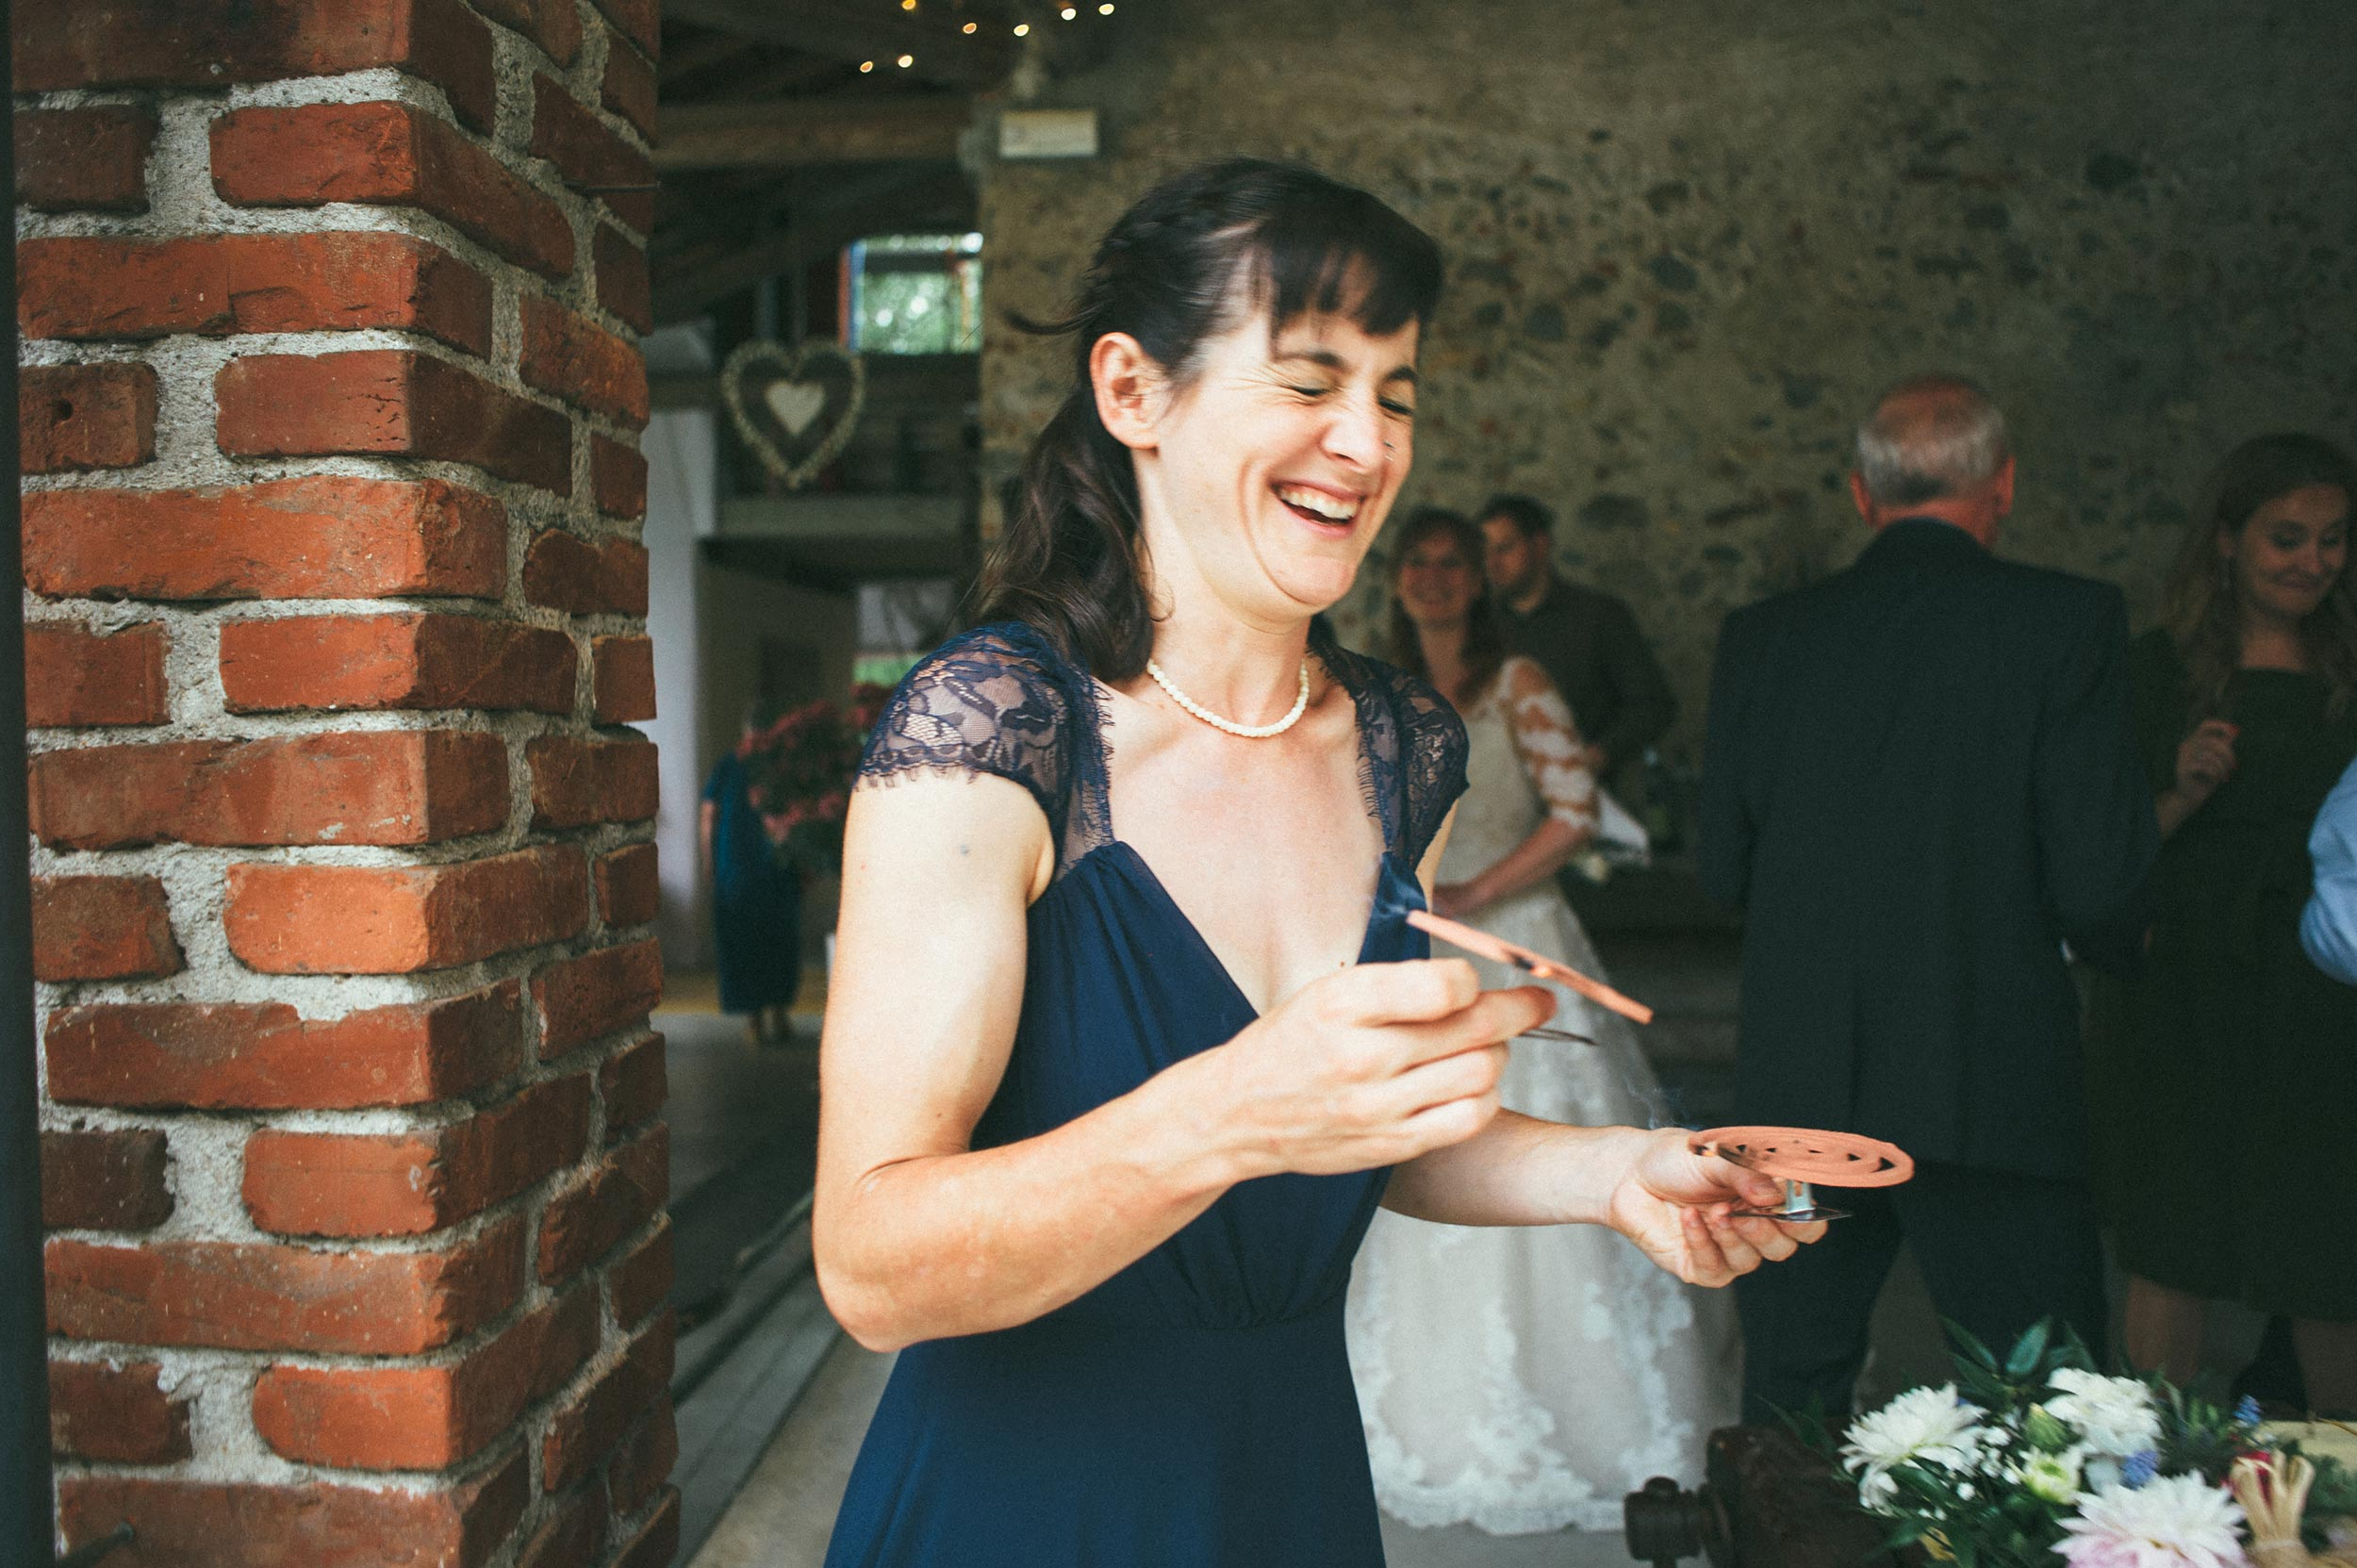 2016-Julius-Silke-Lake-Orta-Wedding-Photographer-Italy-Alessandro-Avenali-98.jpg